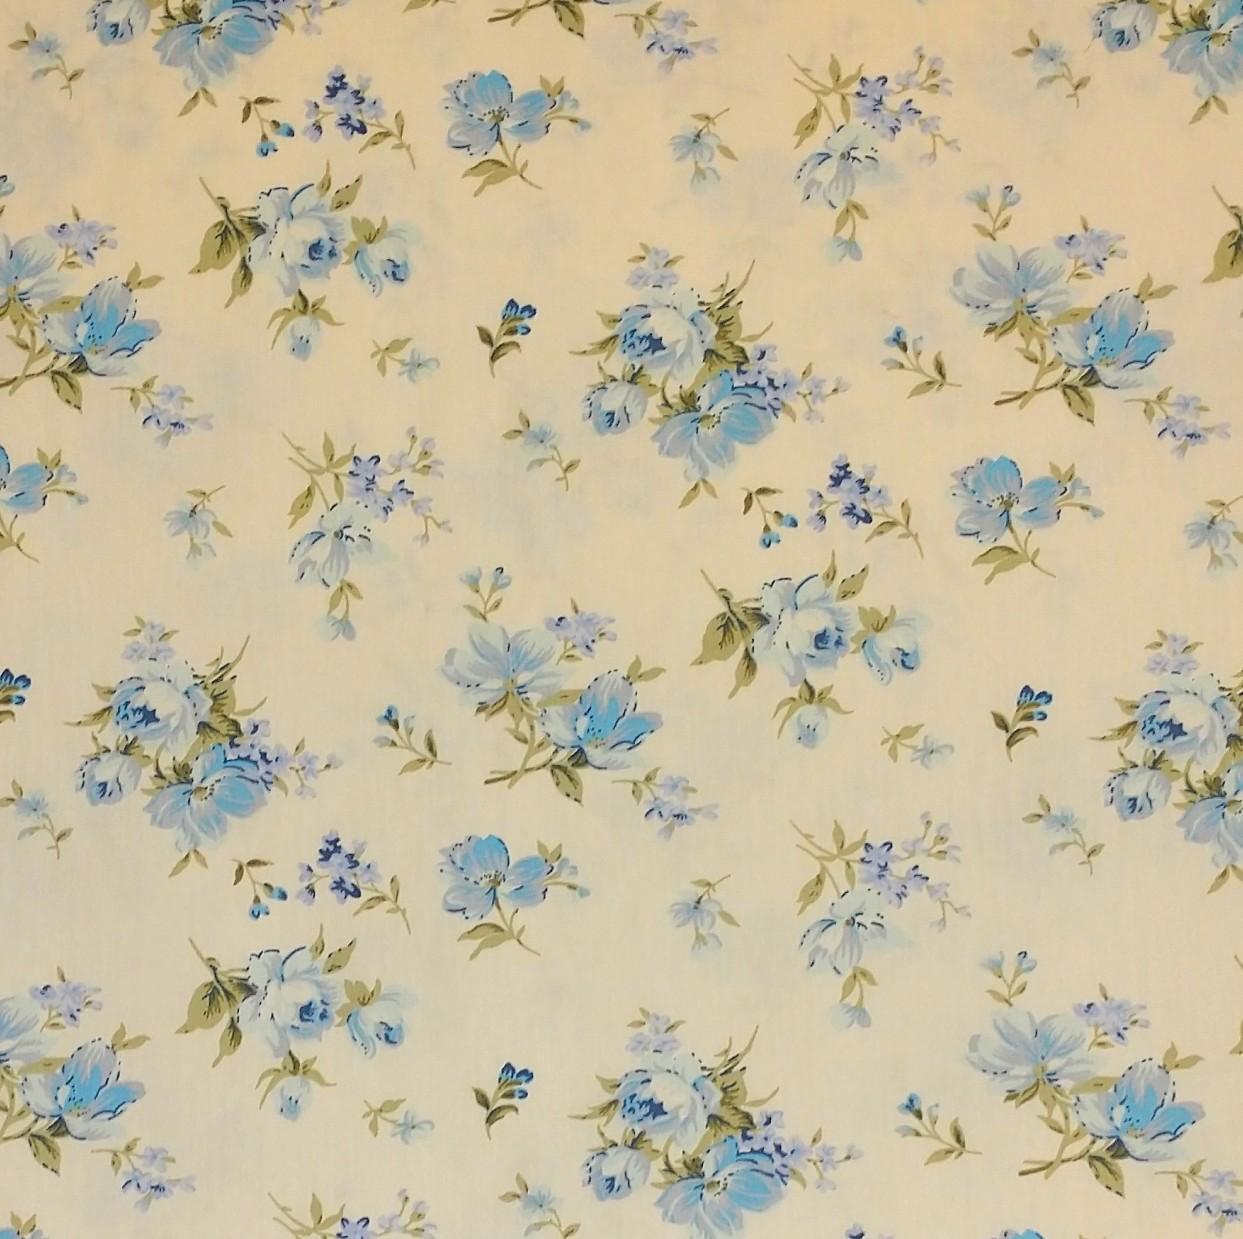 tela algodón colección flores